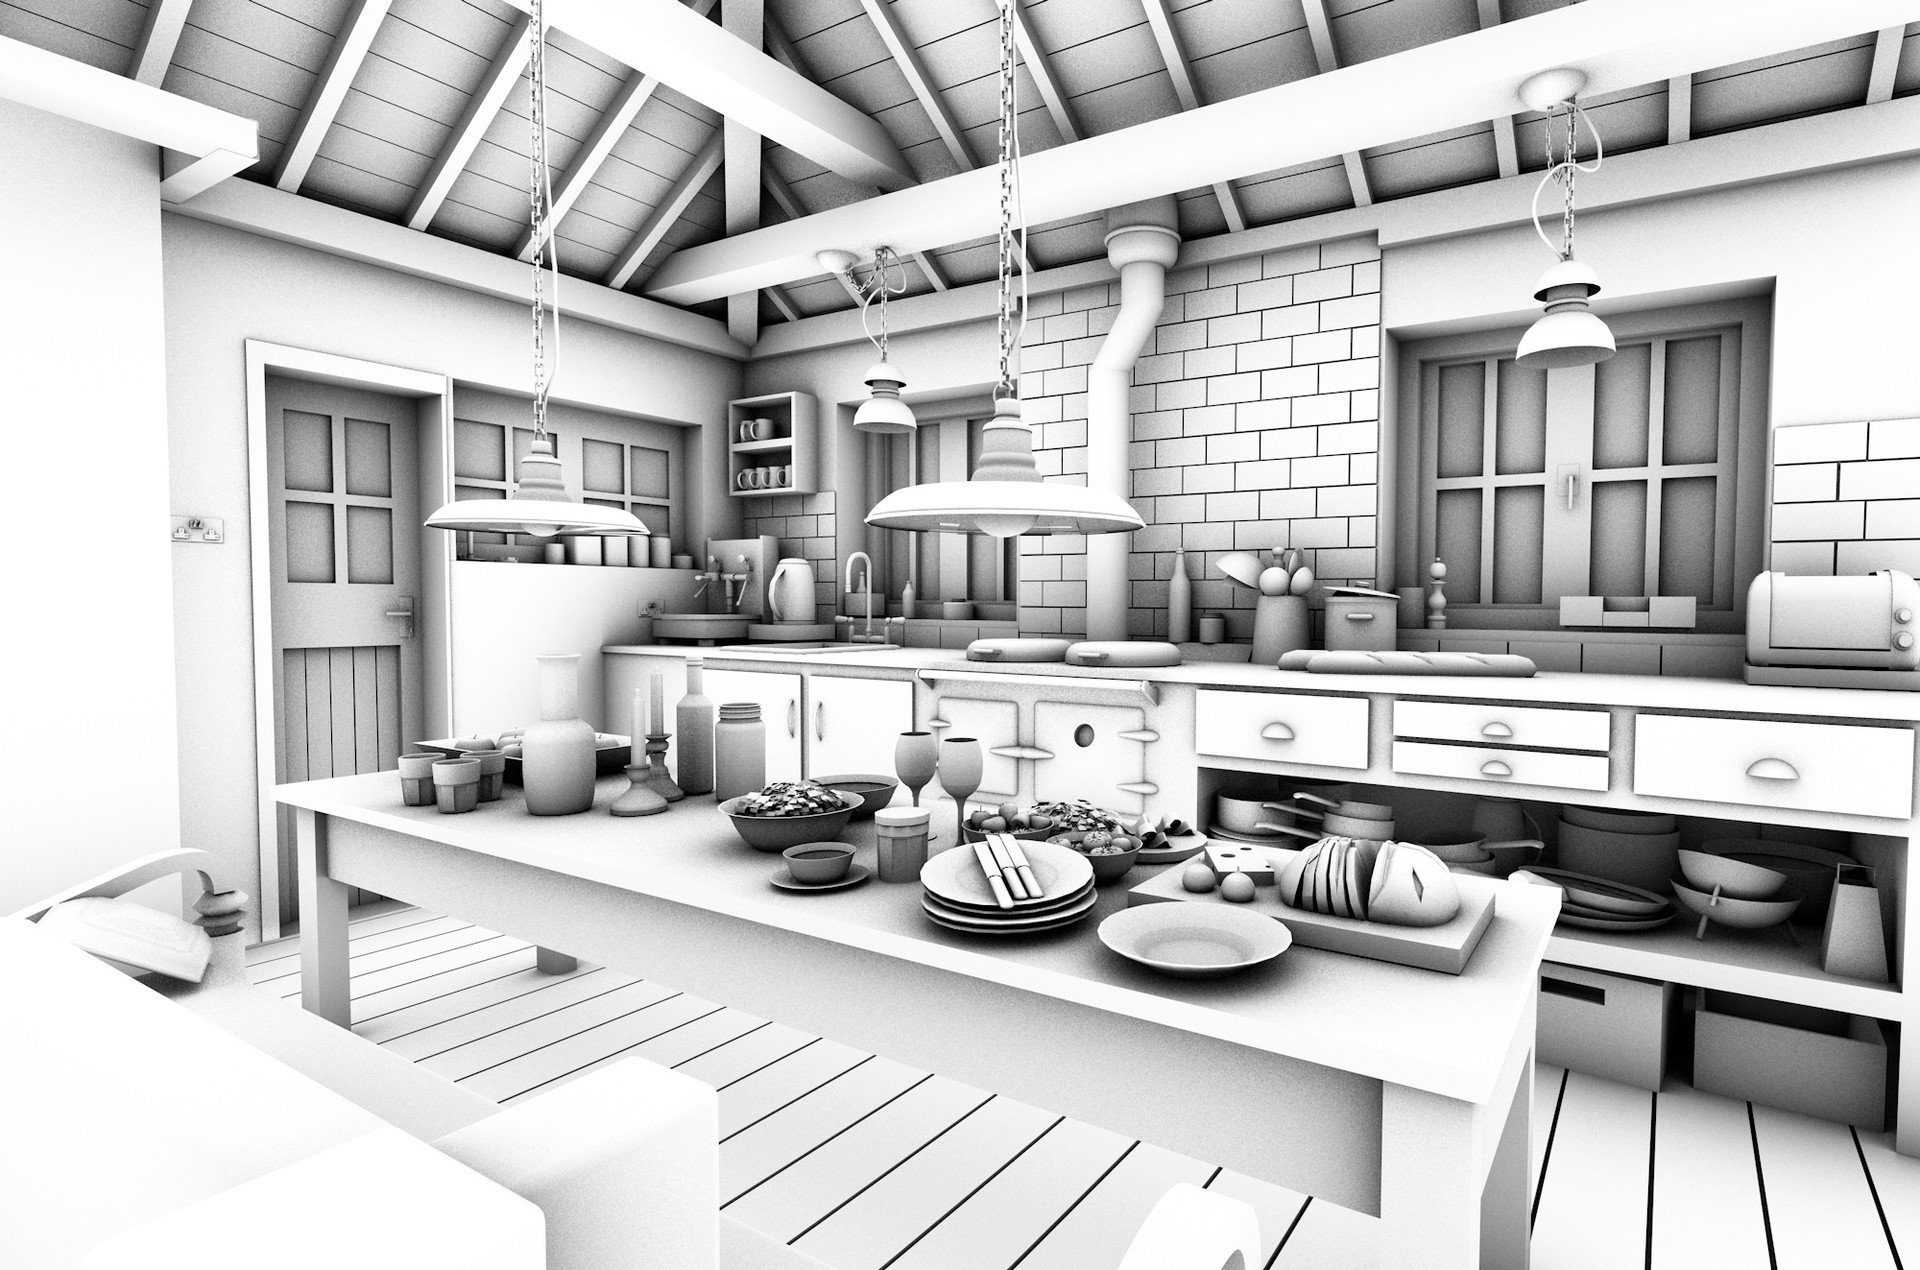 Noa Jacob - Kitchen